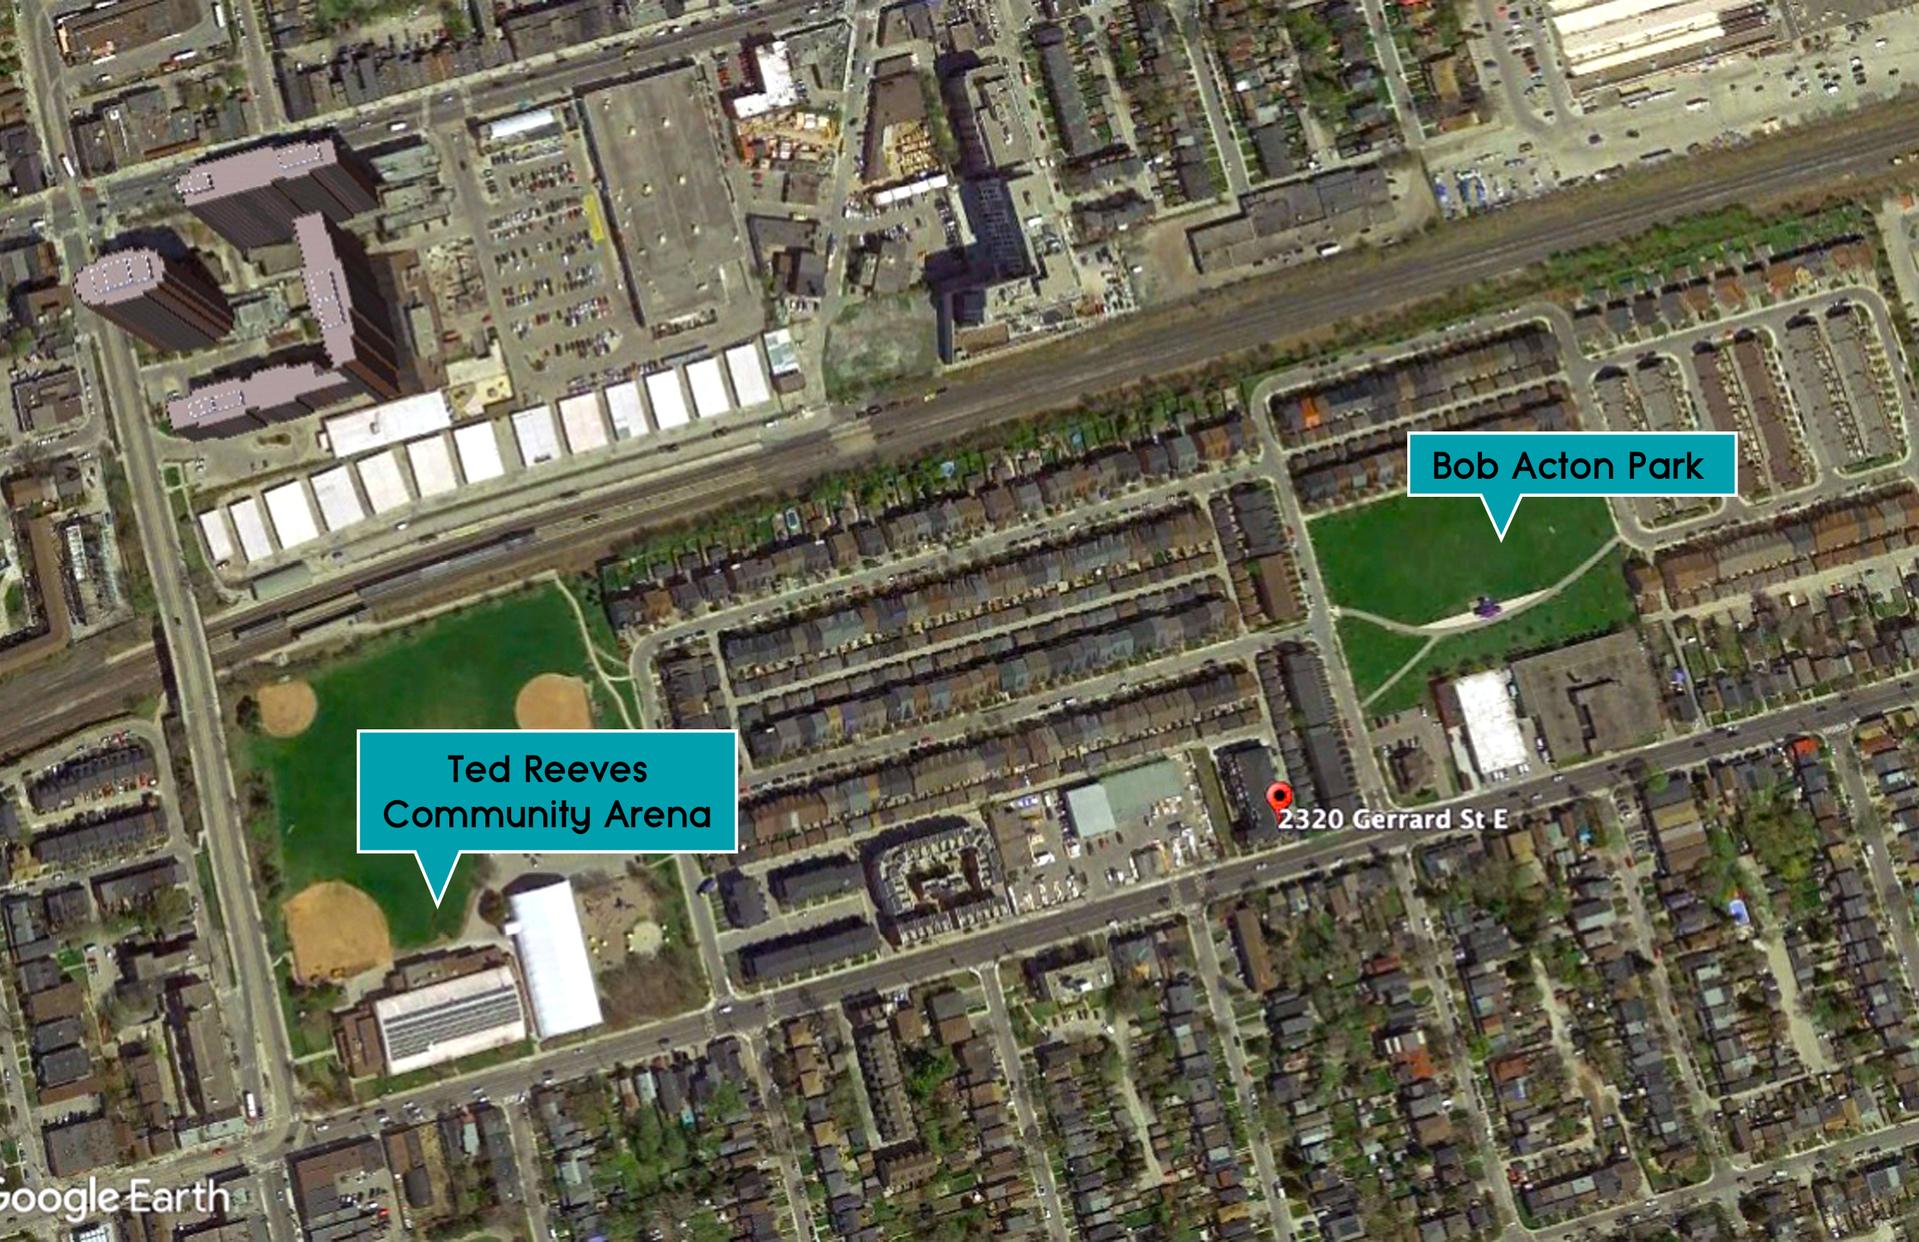 Aerial of Parks at 114 - 2320 Gerrard Street E, East End-Danforth, Toronto